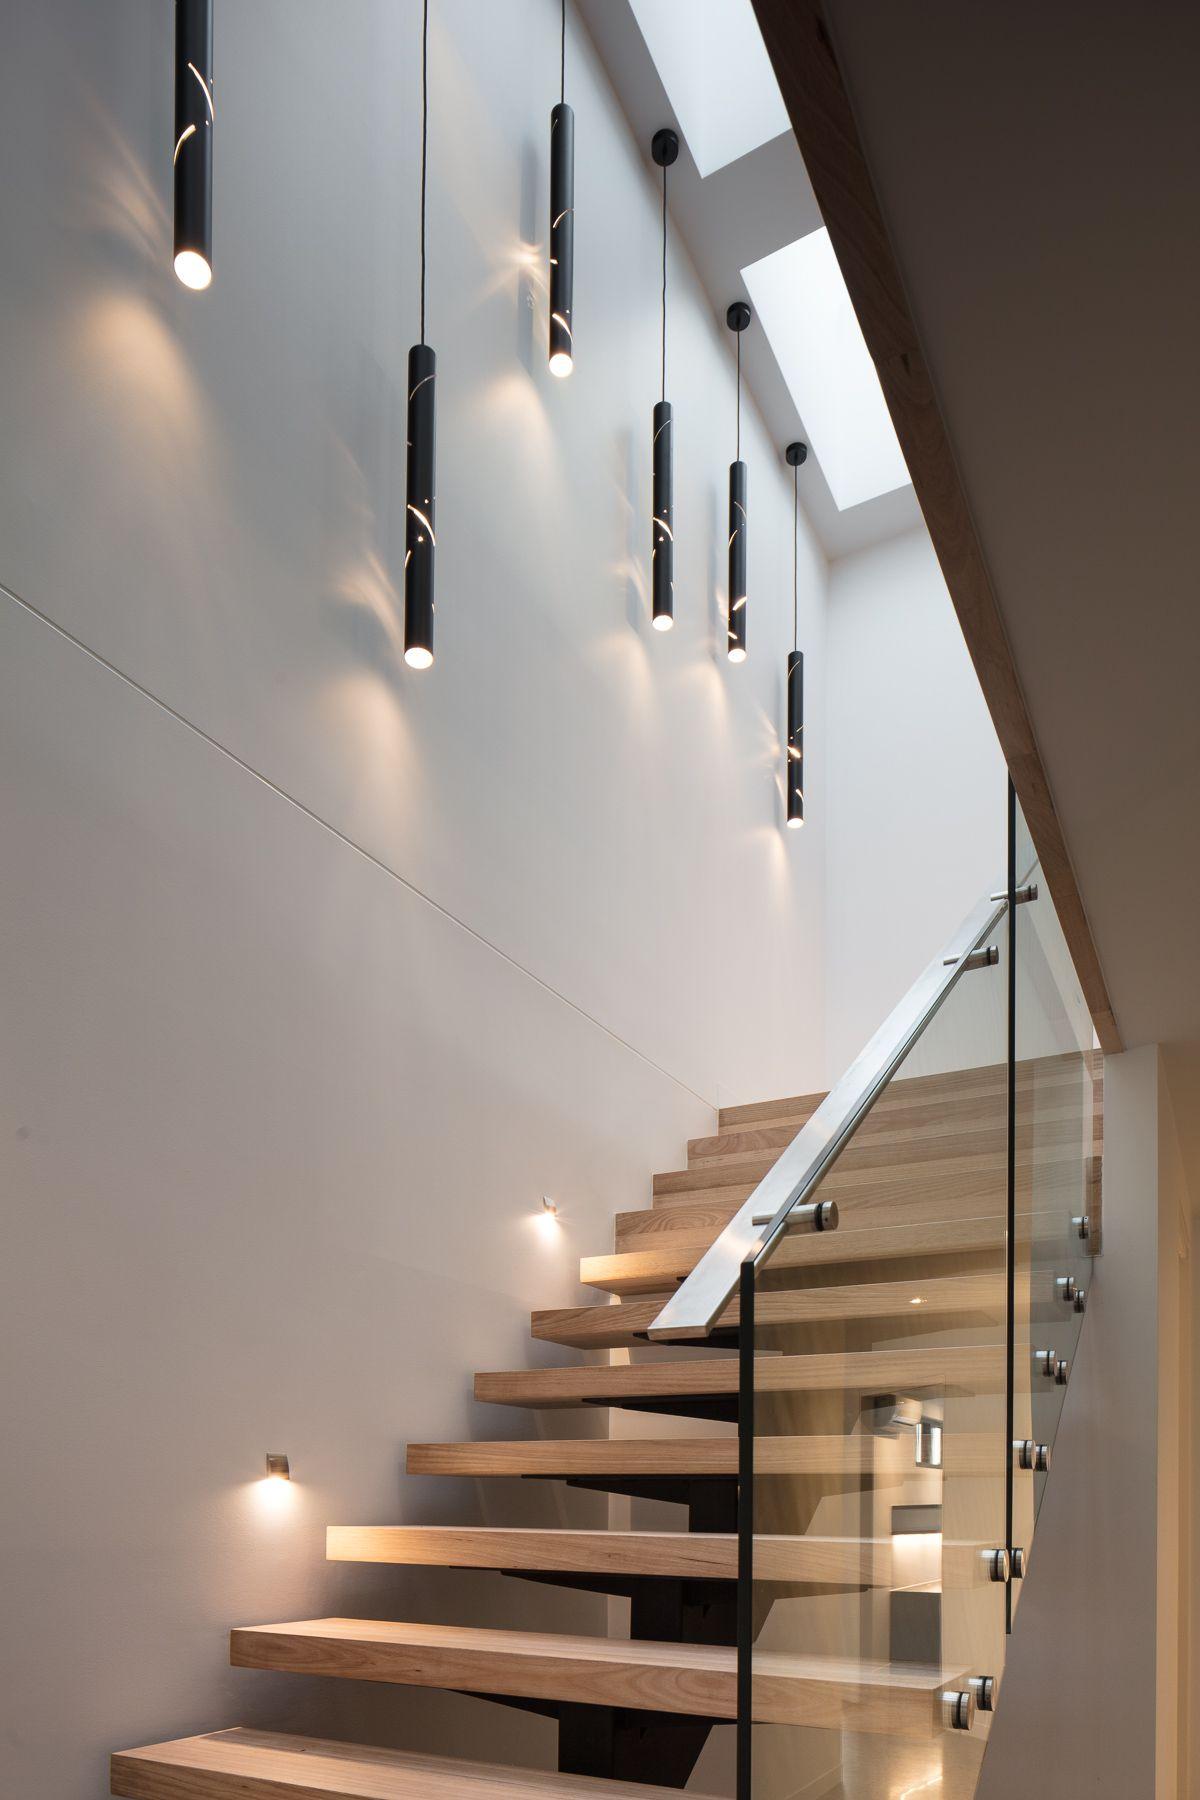 Clark Townhouses Staircase Design Stair Lighting Pendant Stair